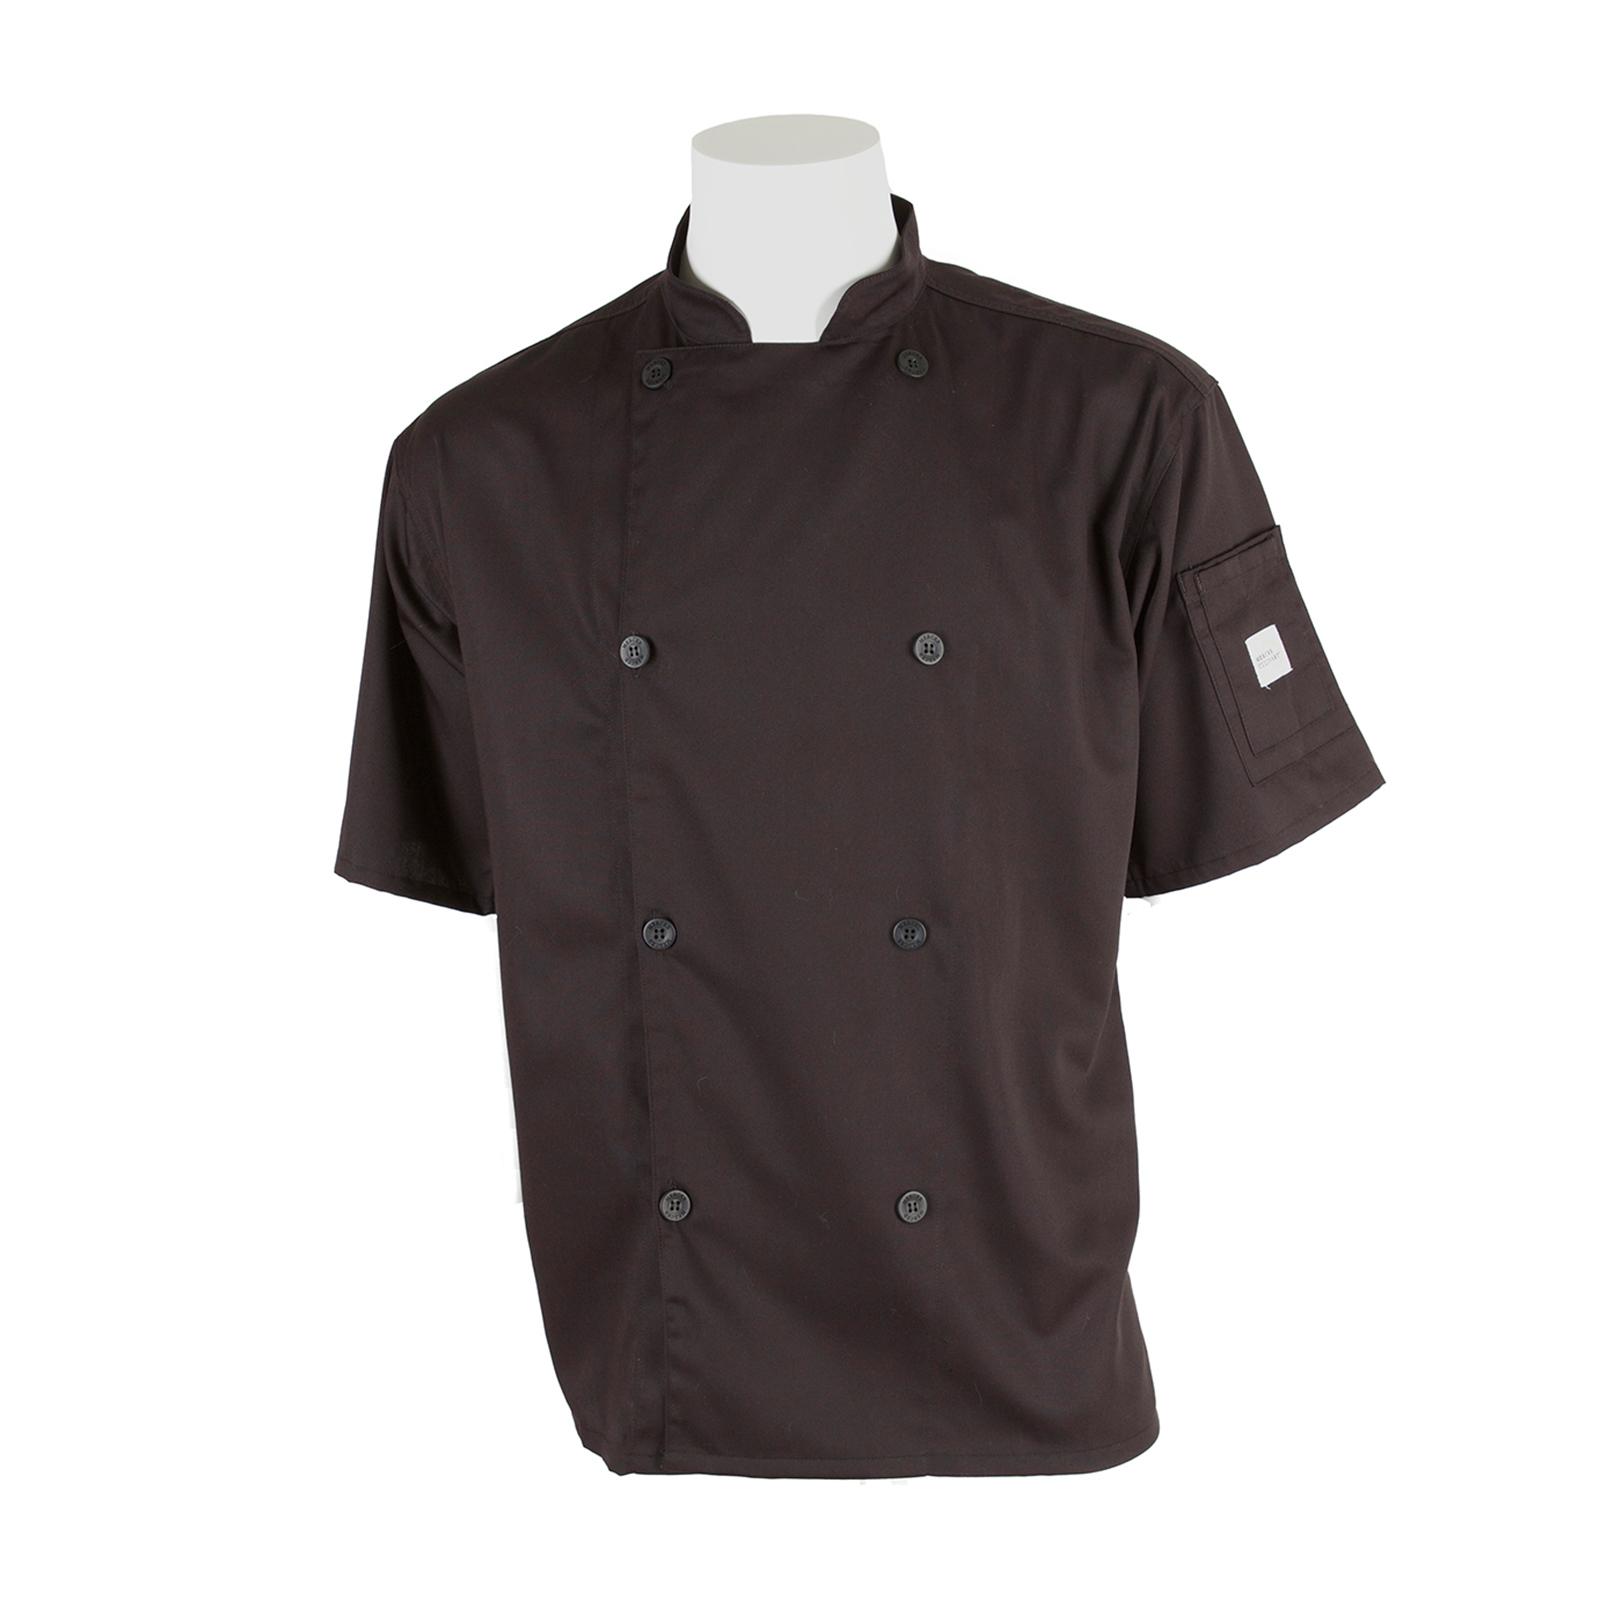 Mercer Culinary M61012BKXS chef's coat